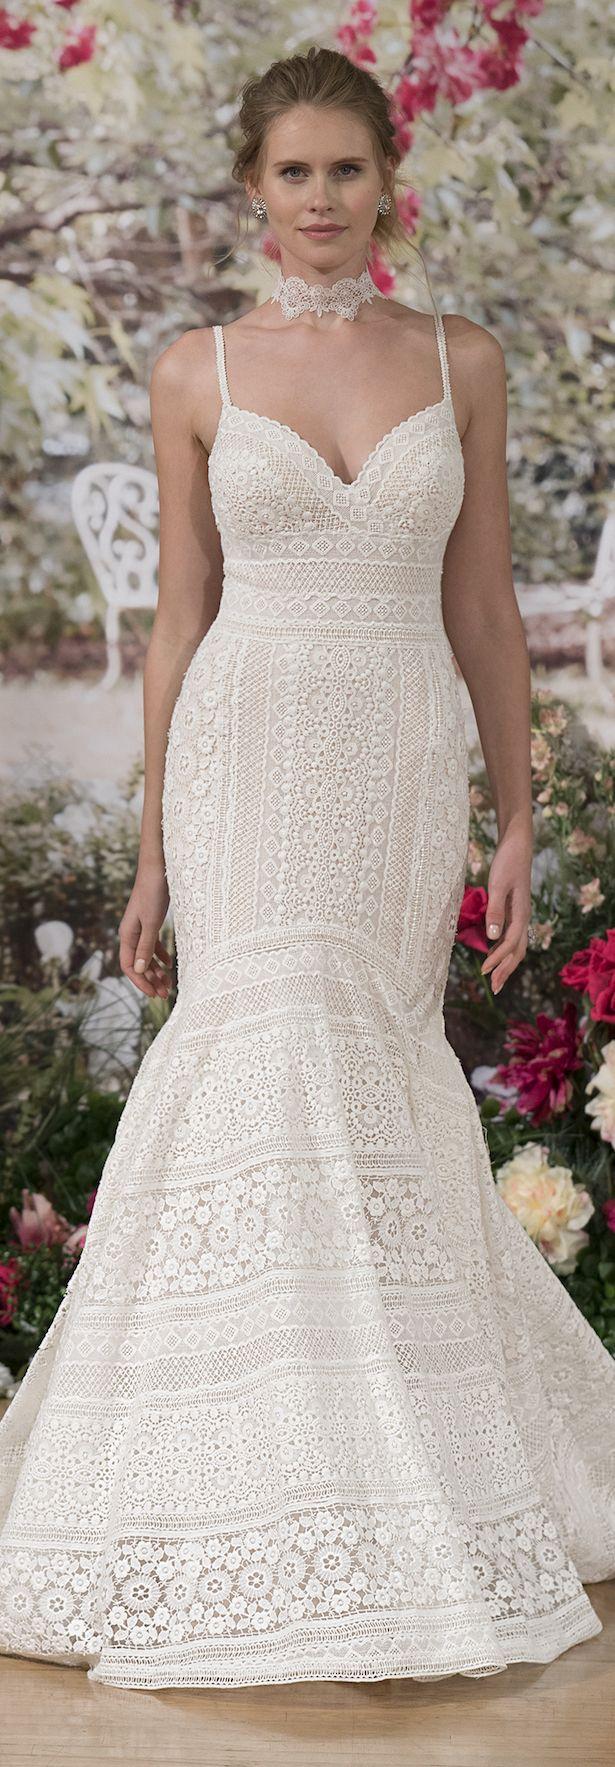 Wedding Dress by Sottero and Midgley Fall 2017 NYBFW